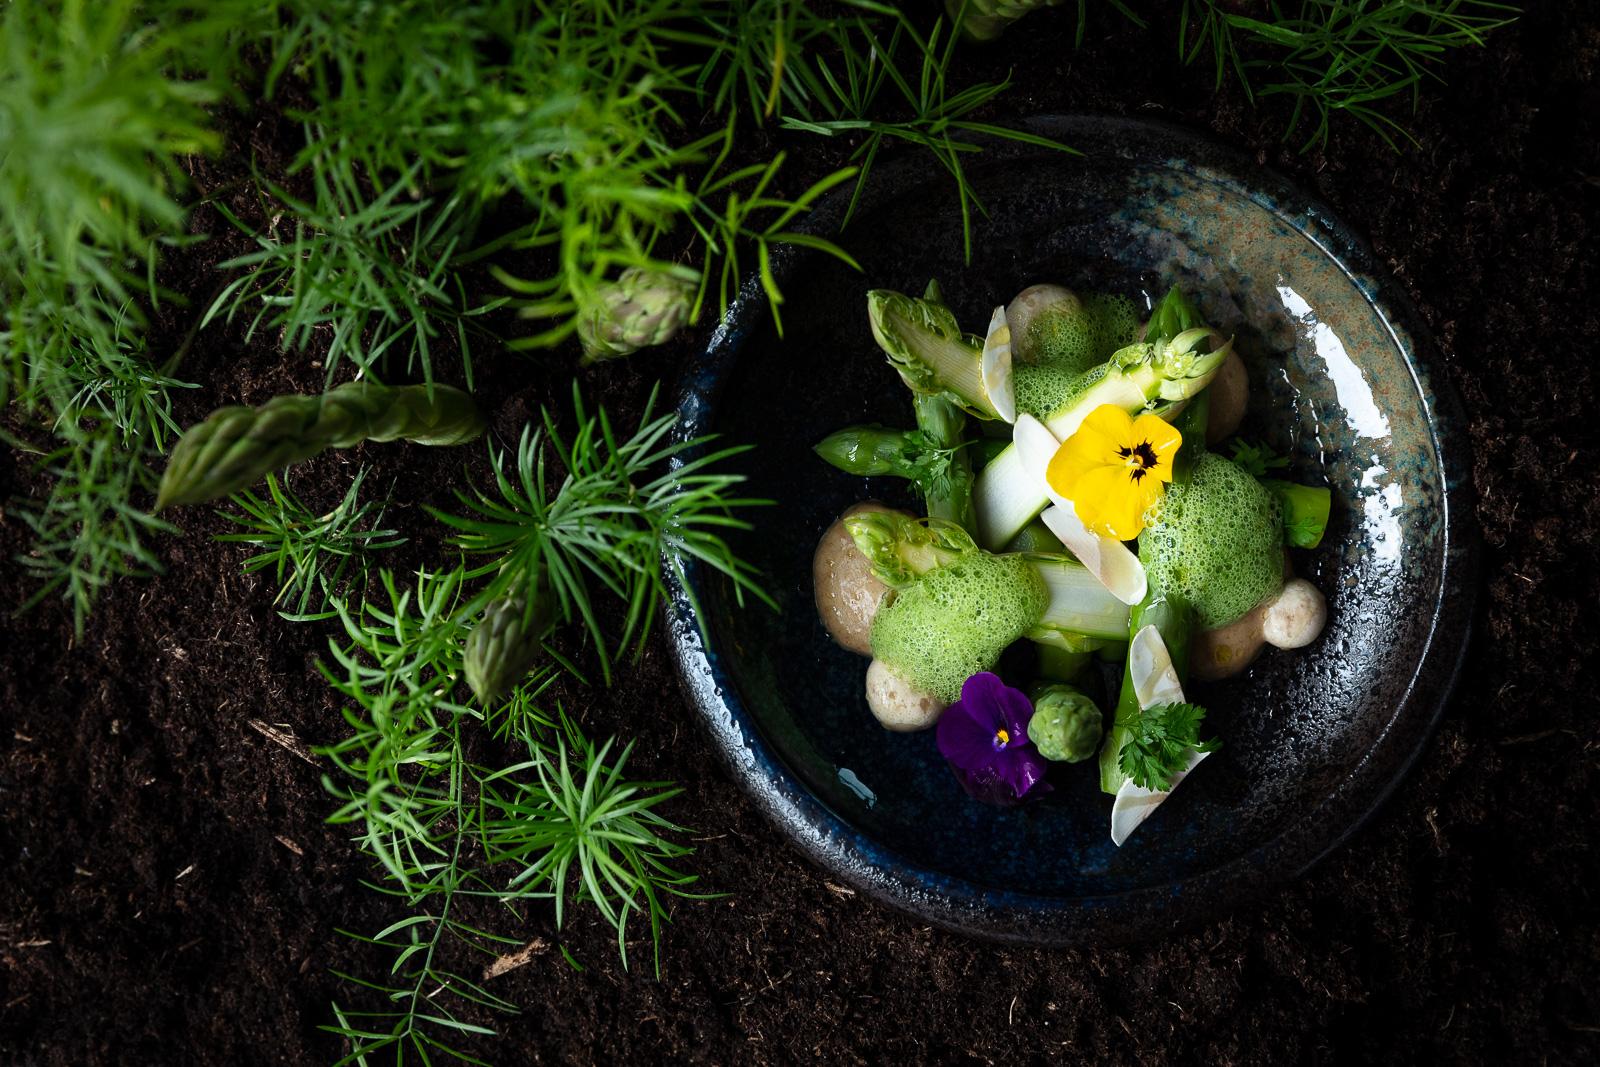 Franck_Hamel_food_photographer_photographeculinaire_valerie_paumelle_agent_st_clair_traiteur (18).jpg